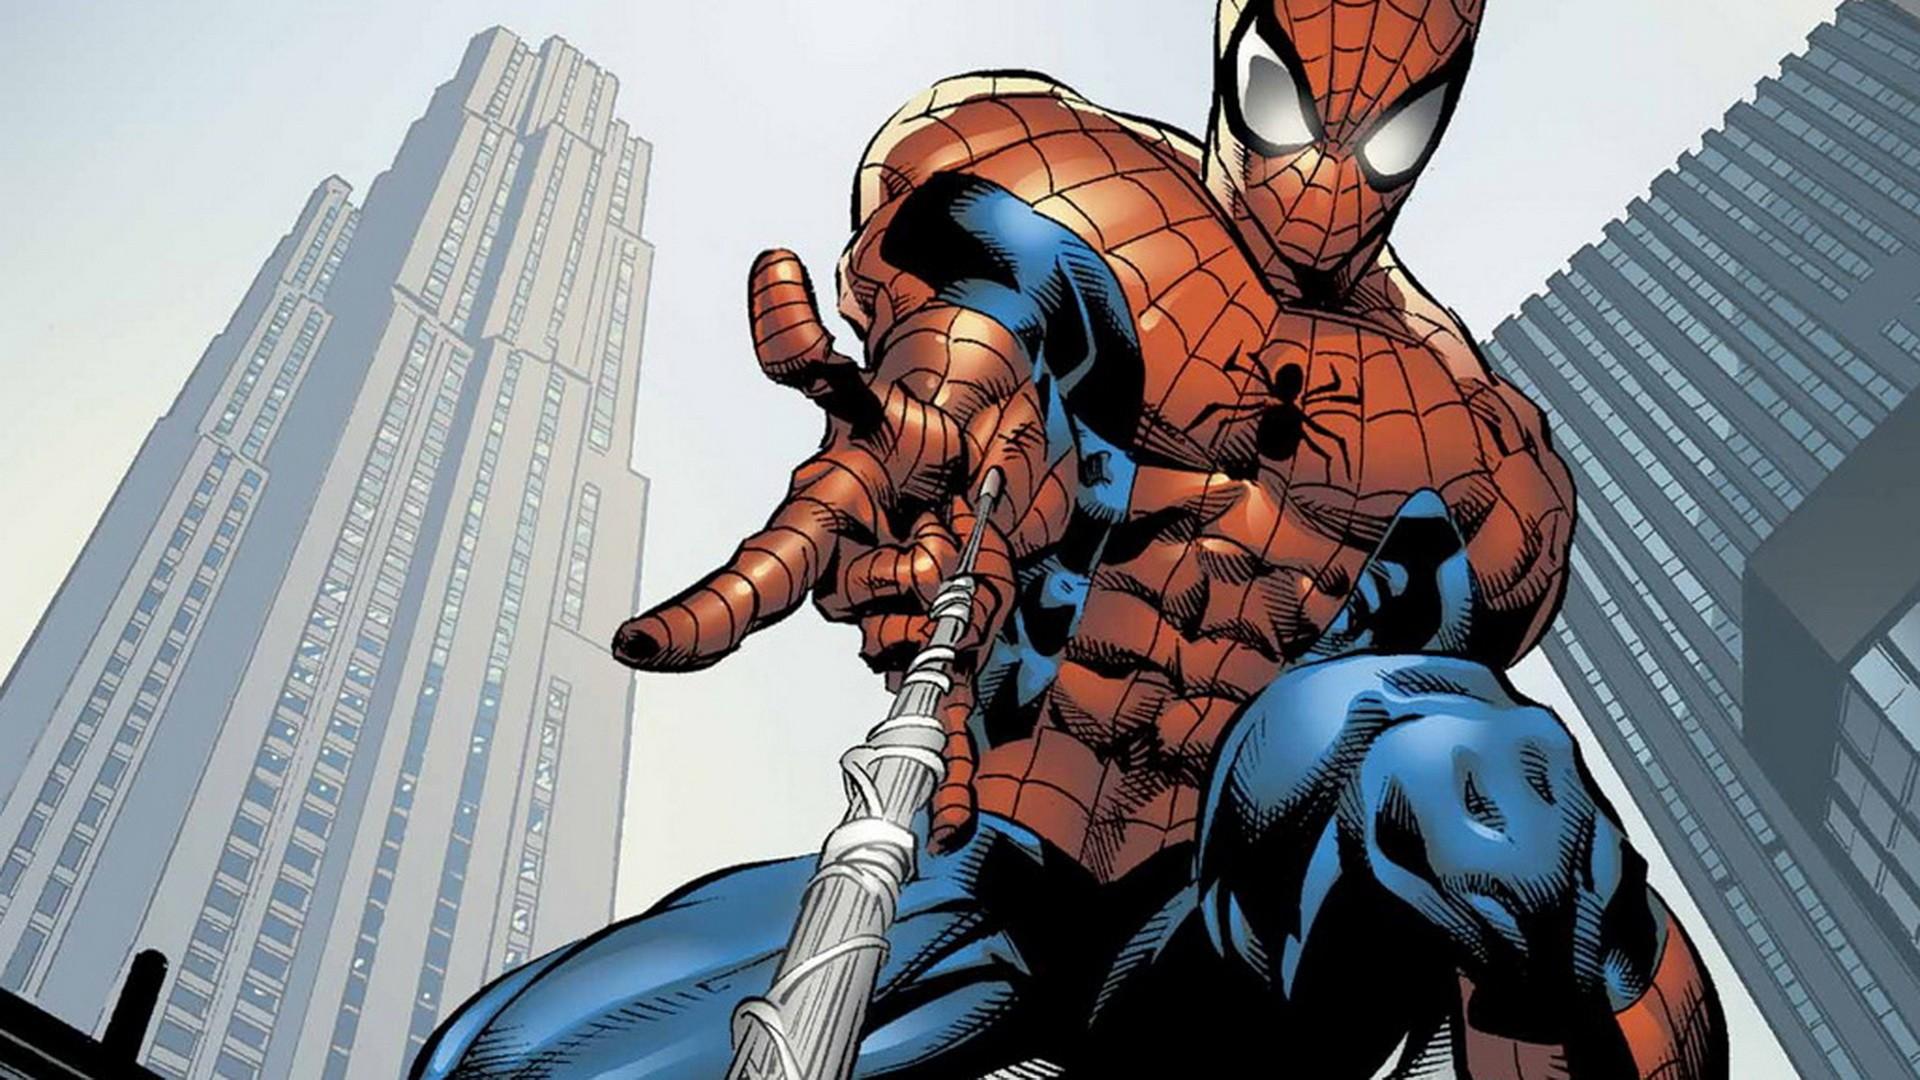 49 Spider Man Comic Wallpaper On Wallpapersafari